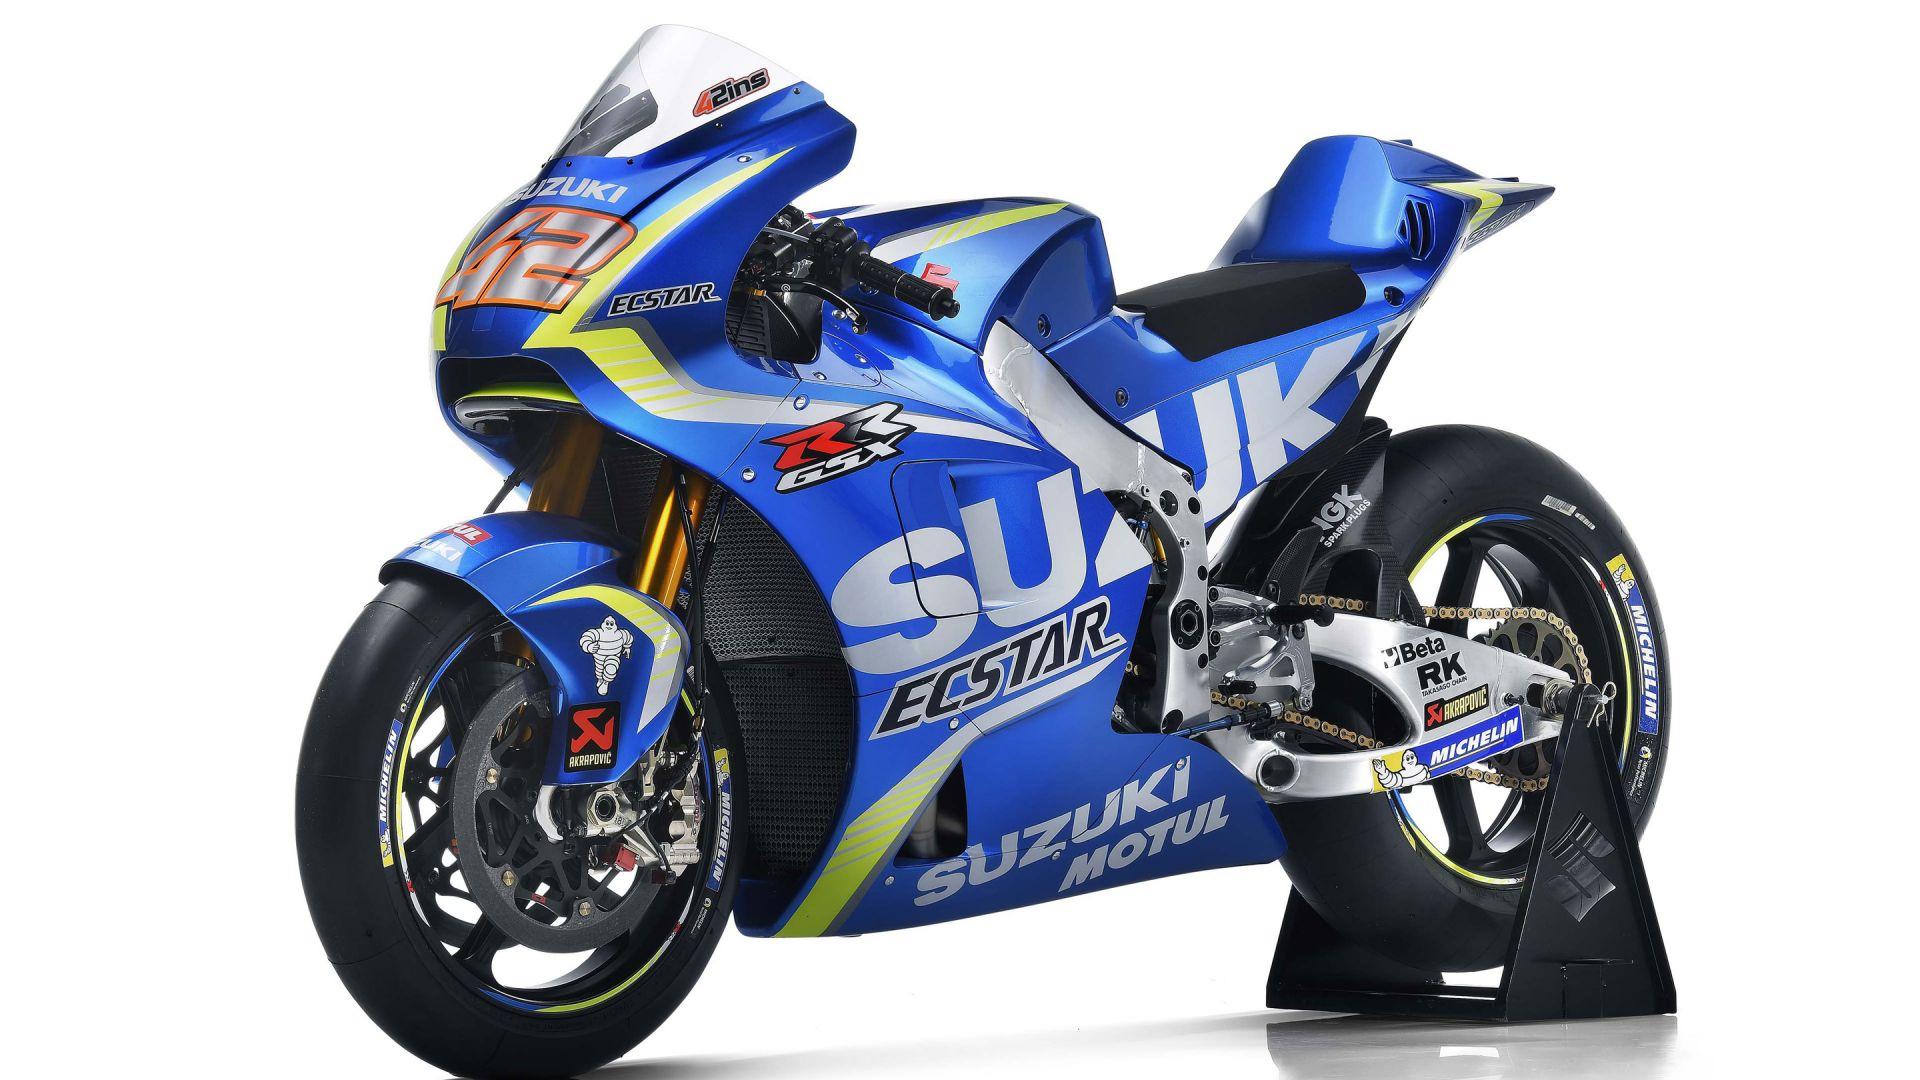 Wallpaper 2017 Team Suzuki Ecstar, motogp, bike